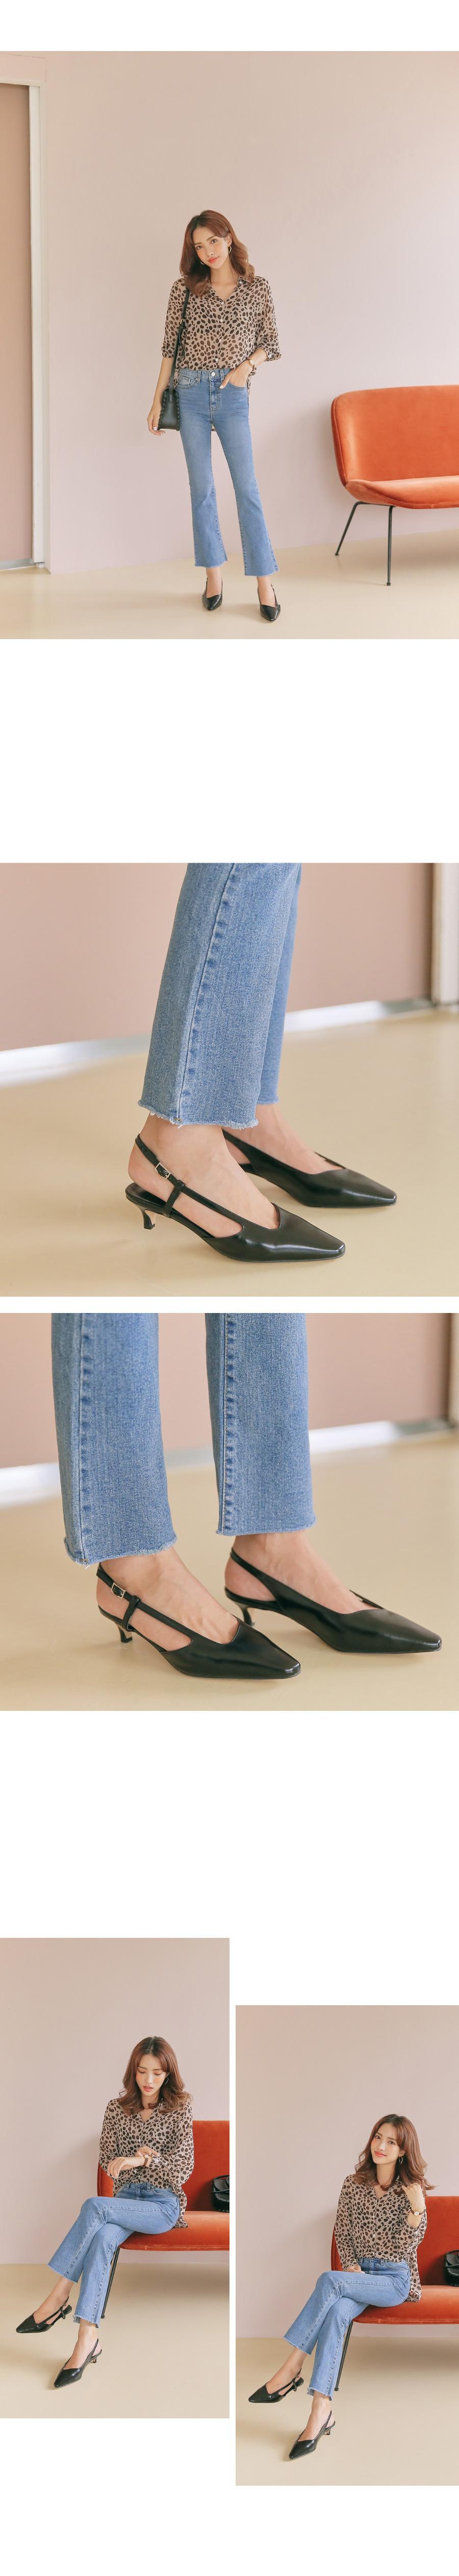 Unshielded Slingback Shoes